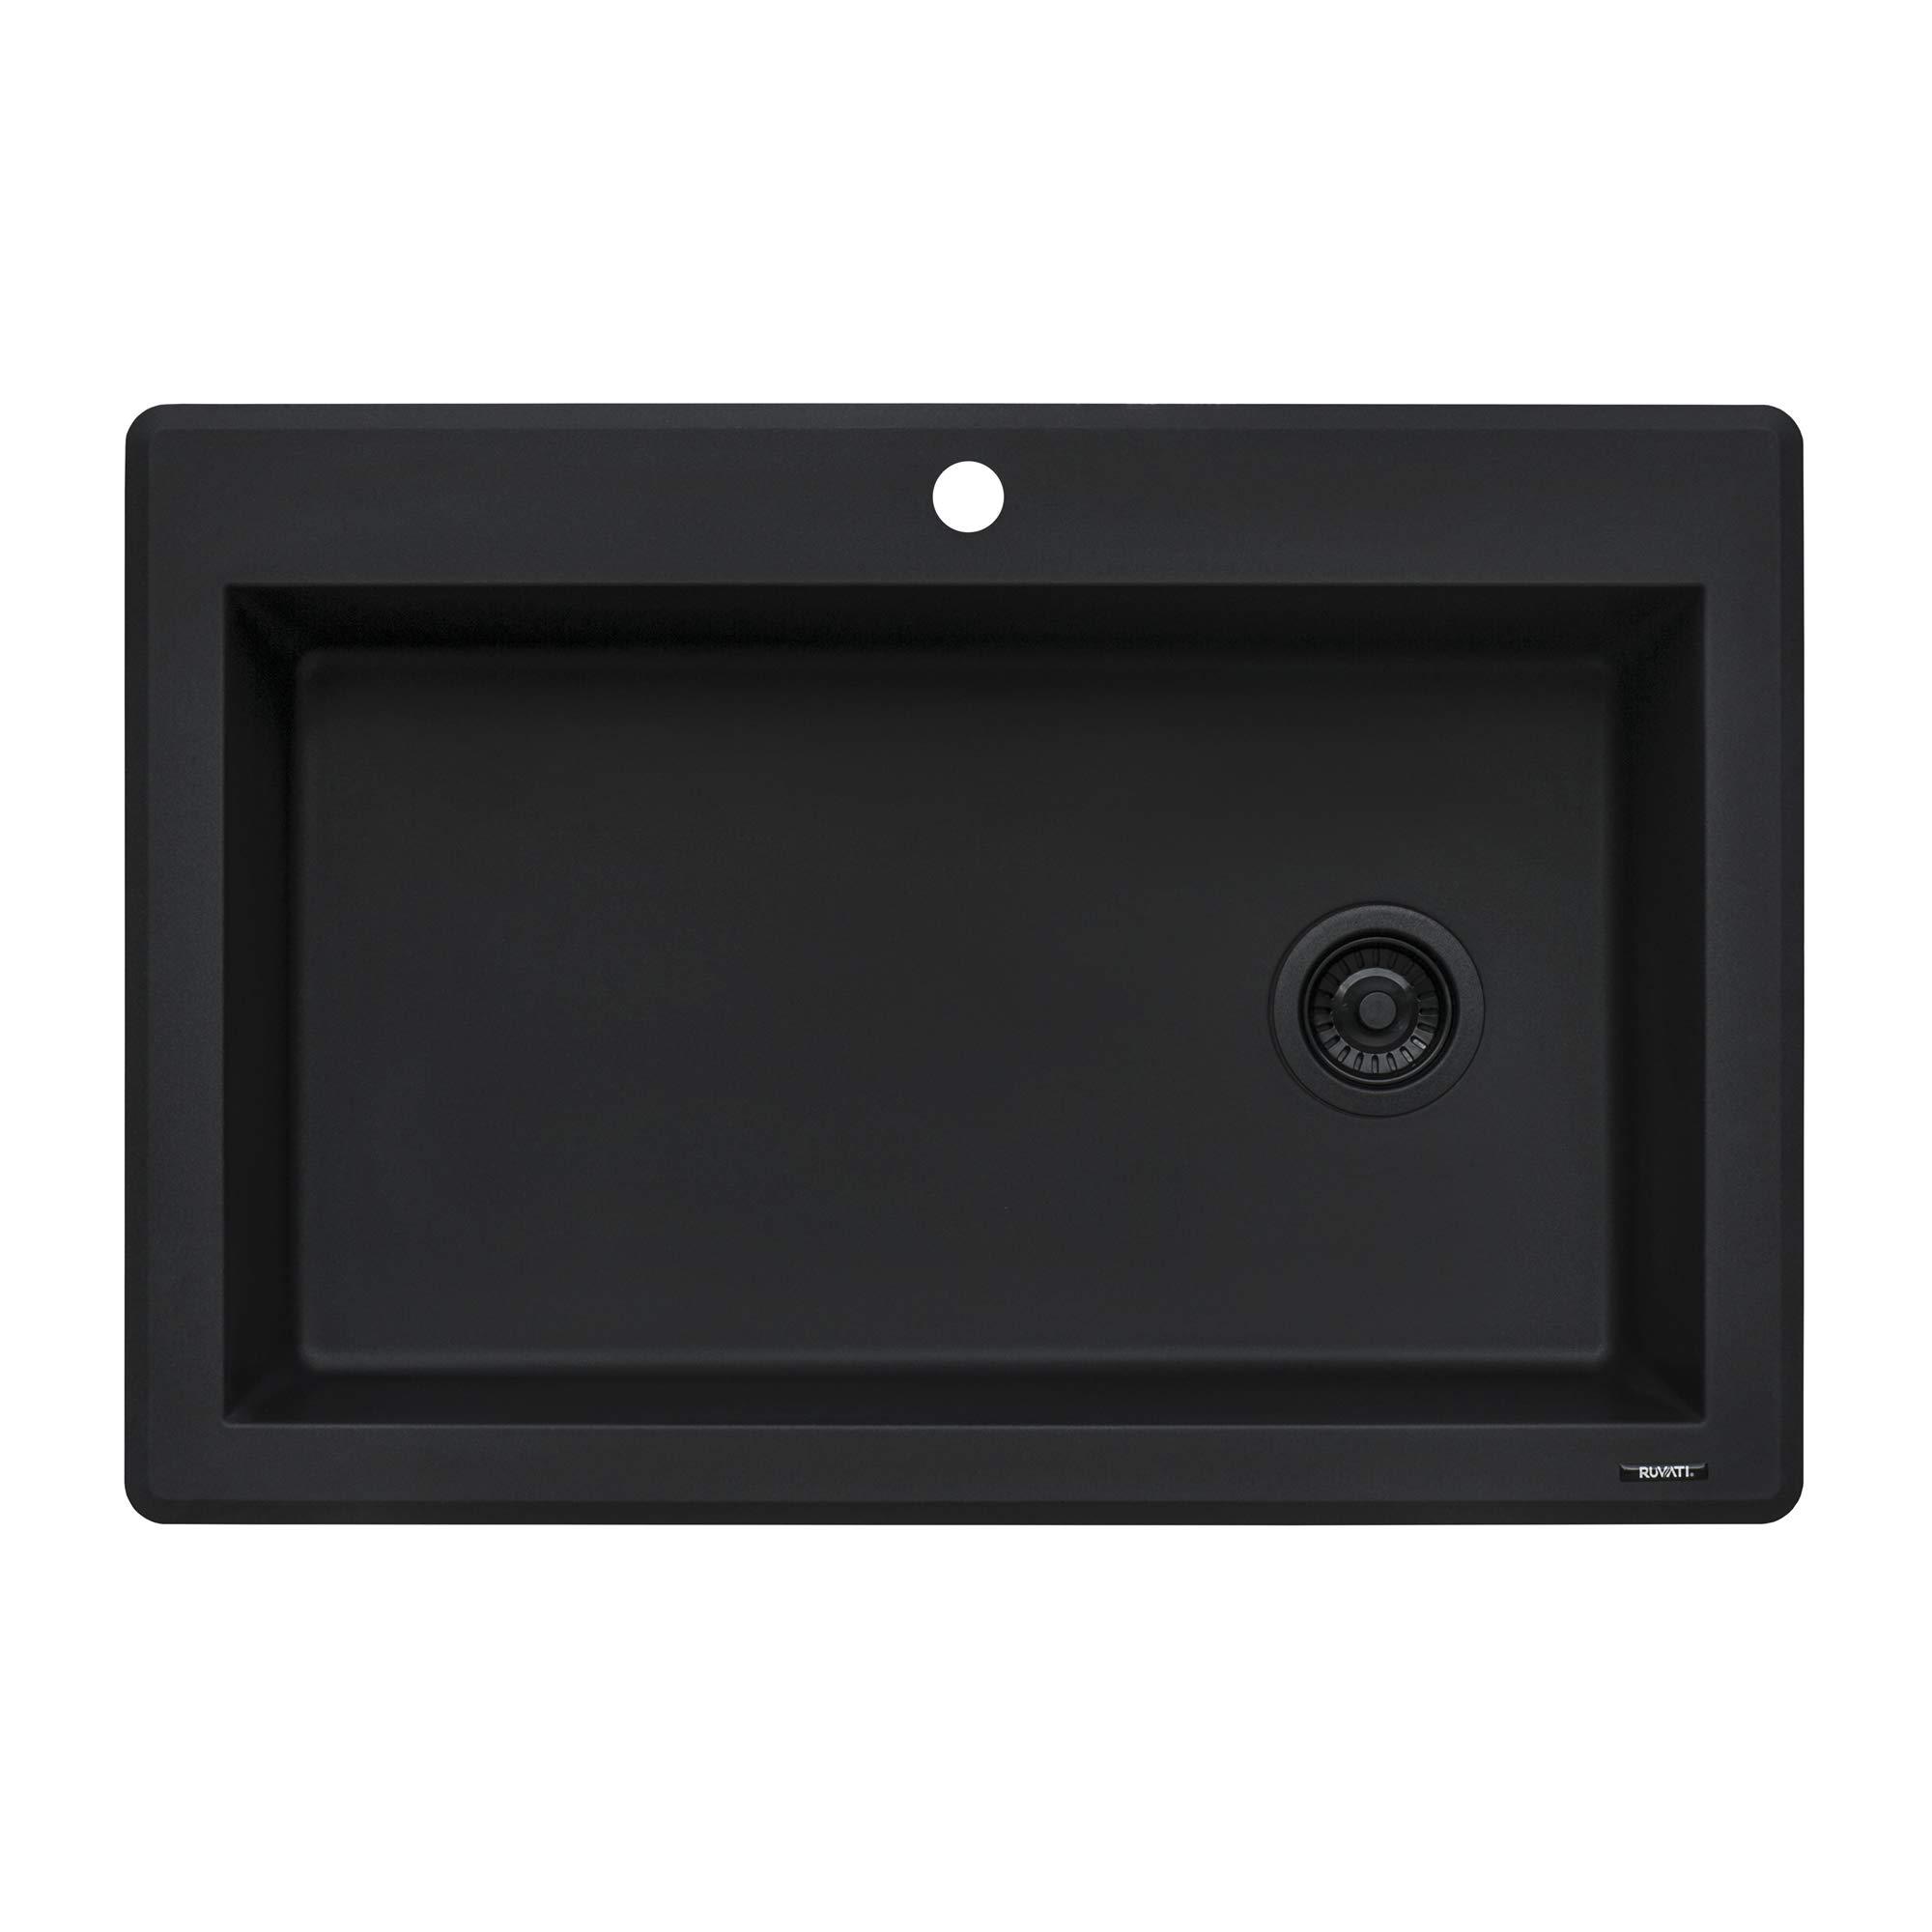 Ruvati 33 x 22 inch Dual-Mount Granite Composite Single Bowl Kitchen Sink - Midnight Black - RVG1033BK